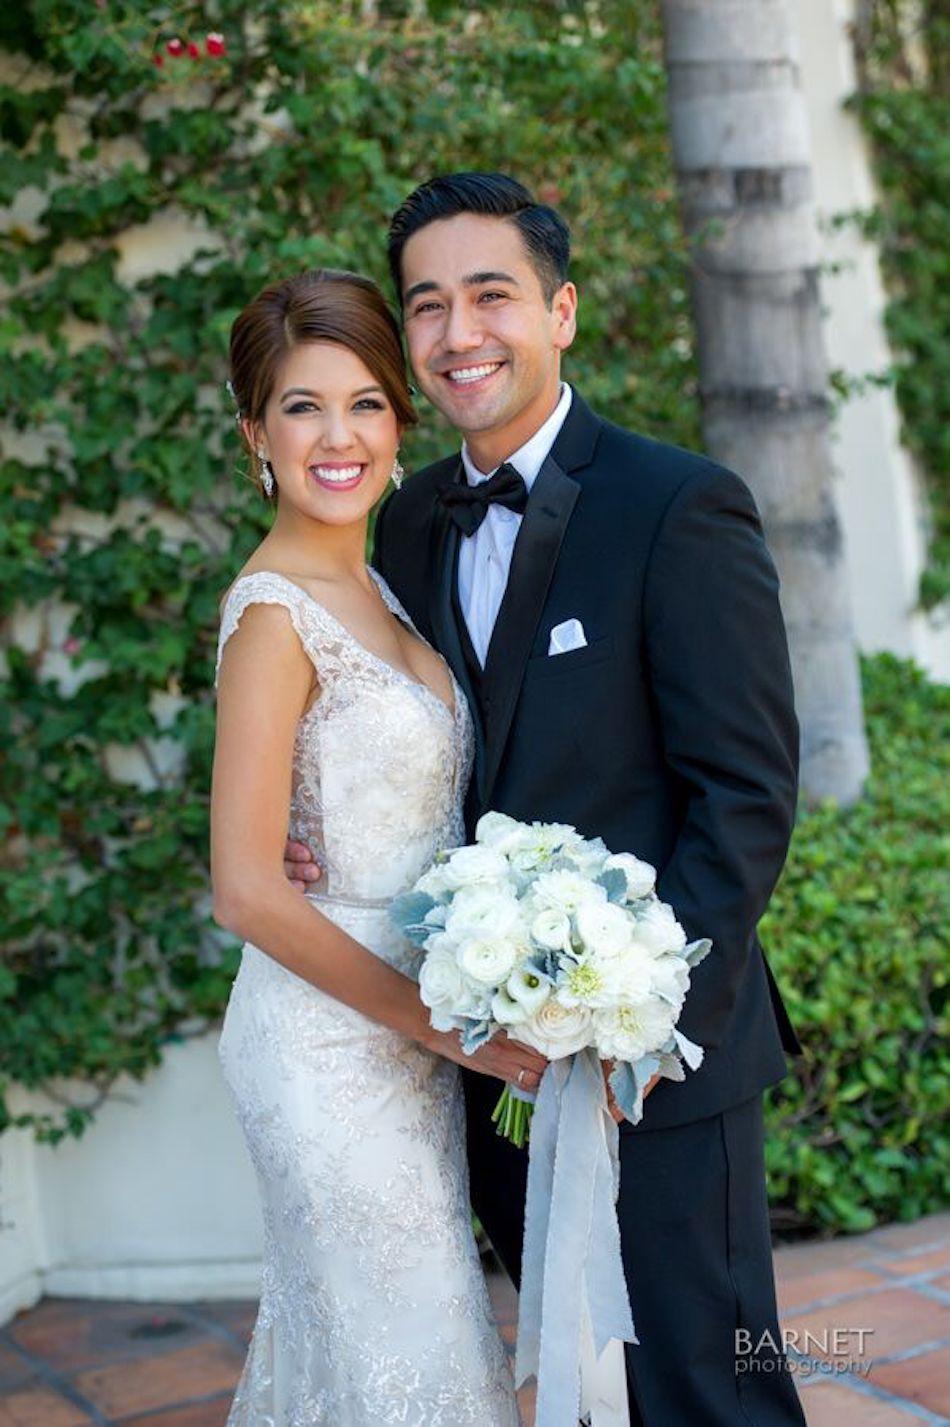 elegant outdoor wedding, flowers by cina, powdery floral design